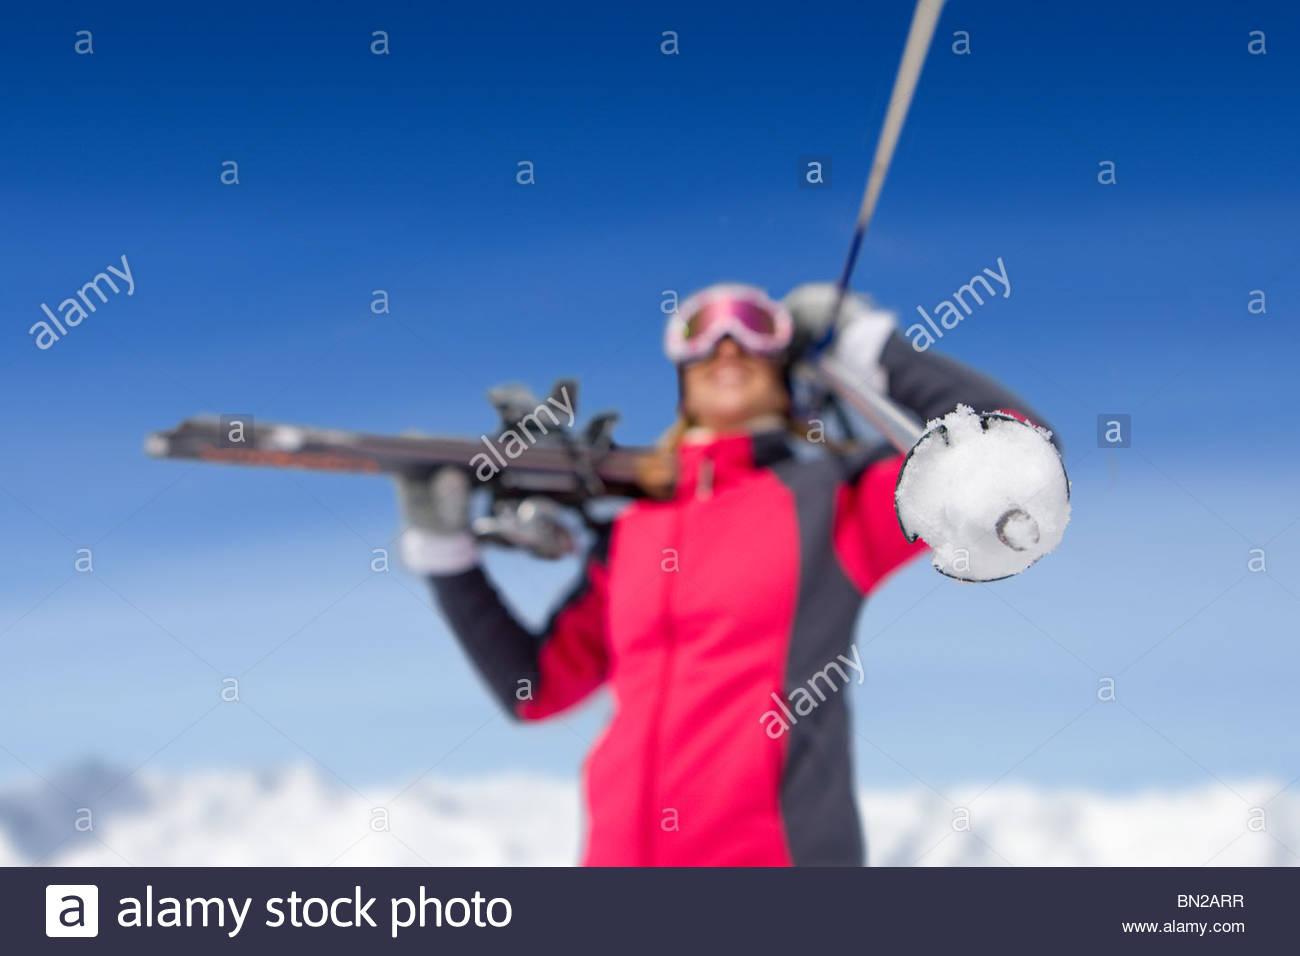 Woman holding skis and ski poles - Stock Image